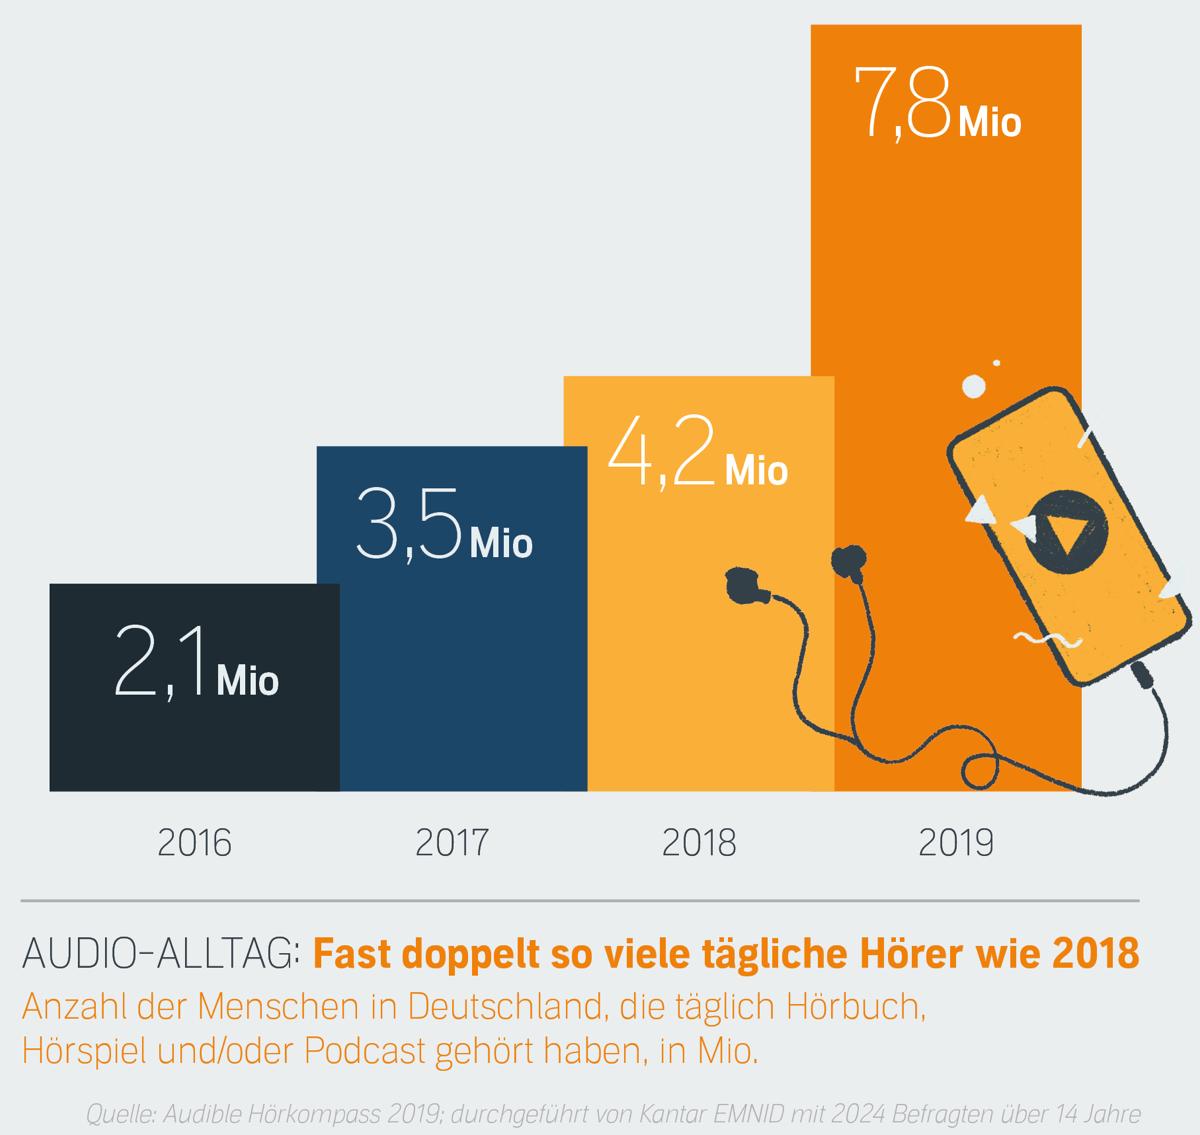 Audible Hörkompass 2019